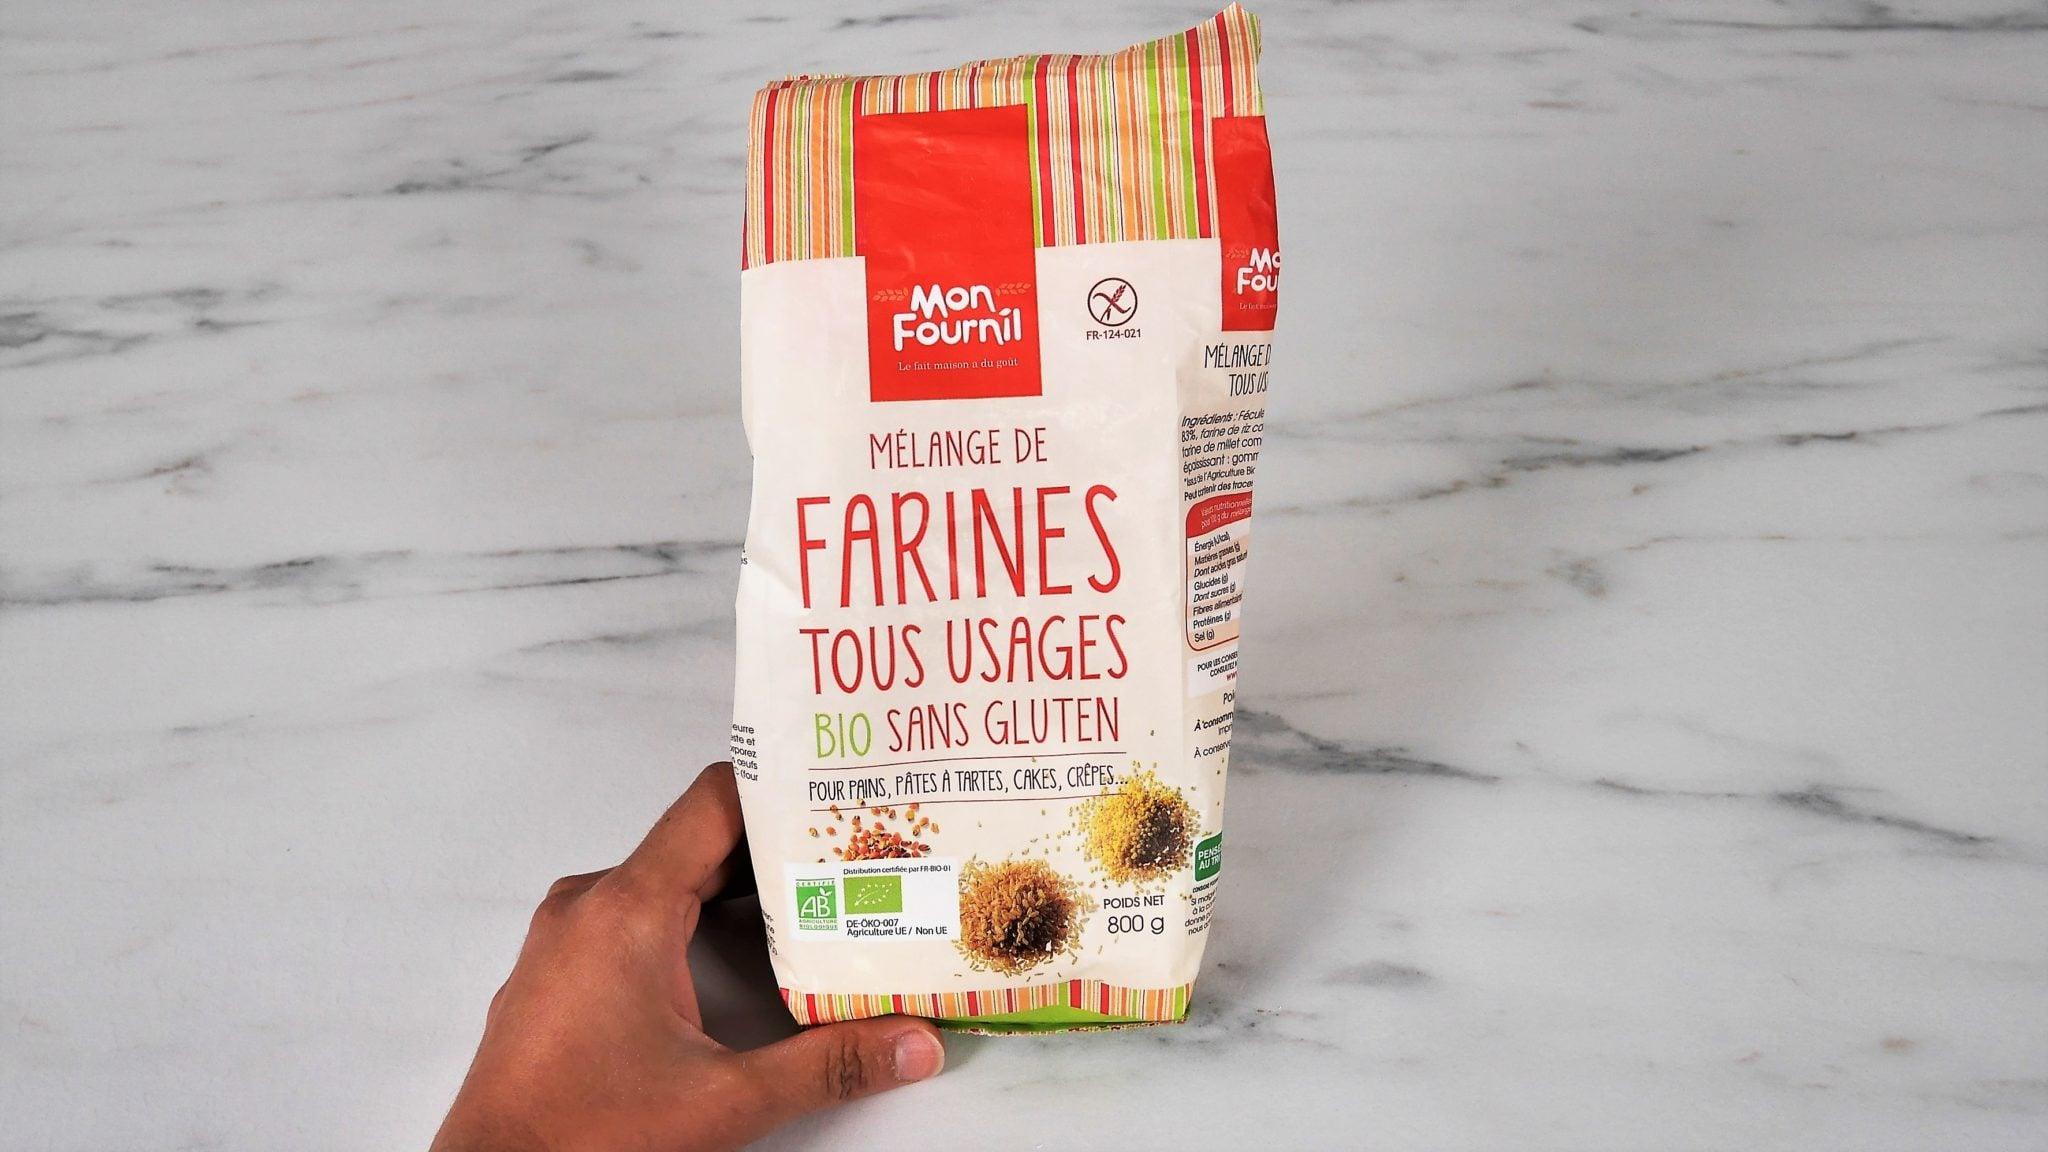 Mélange farine sans gluten tout usage